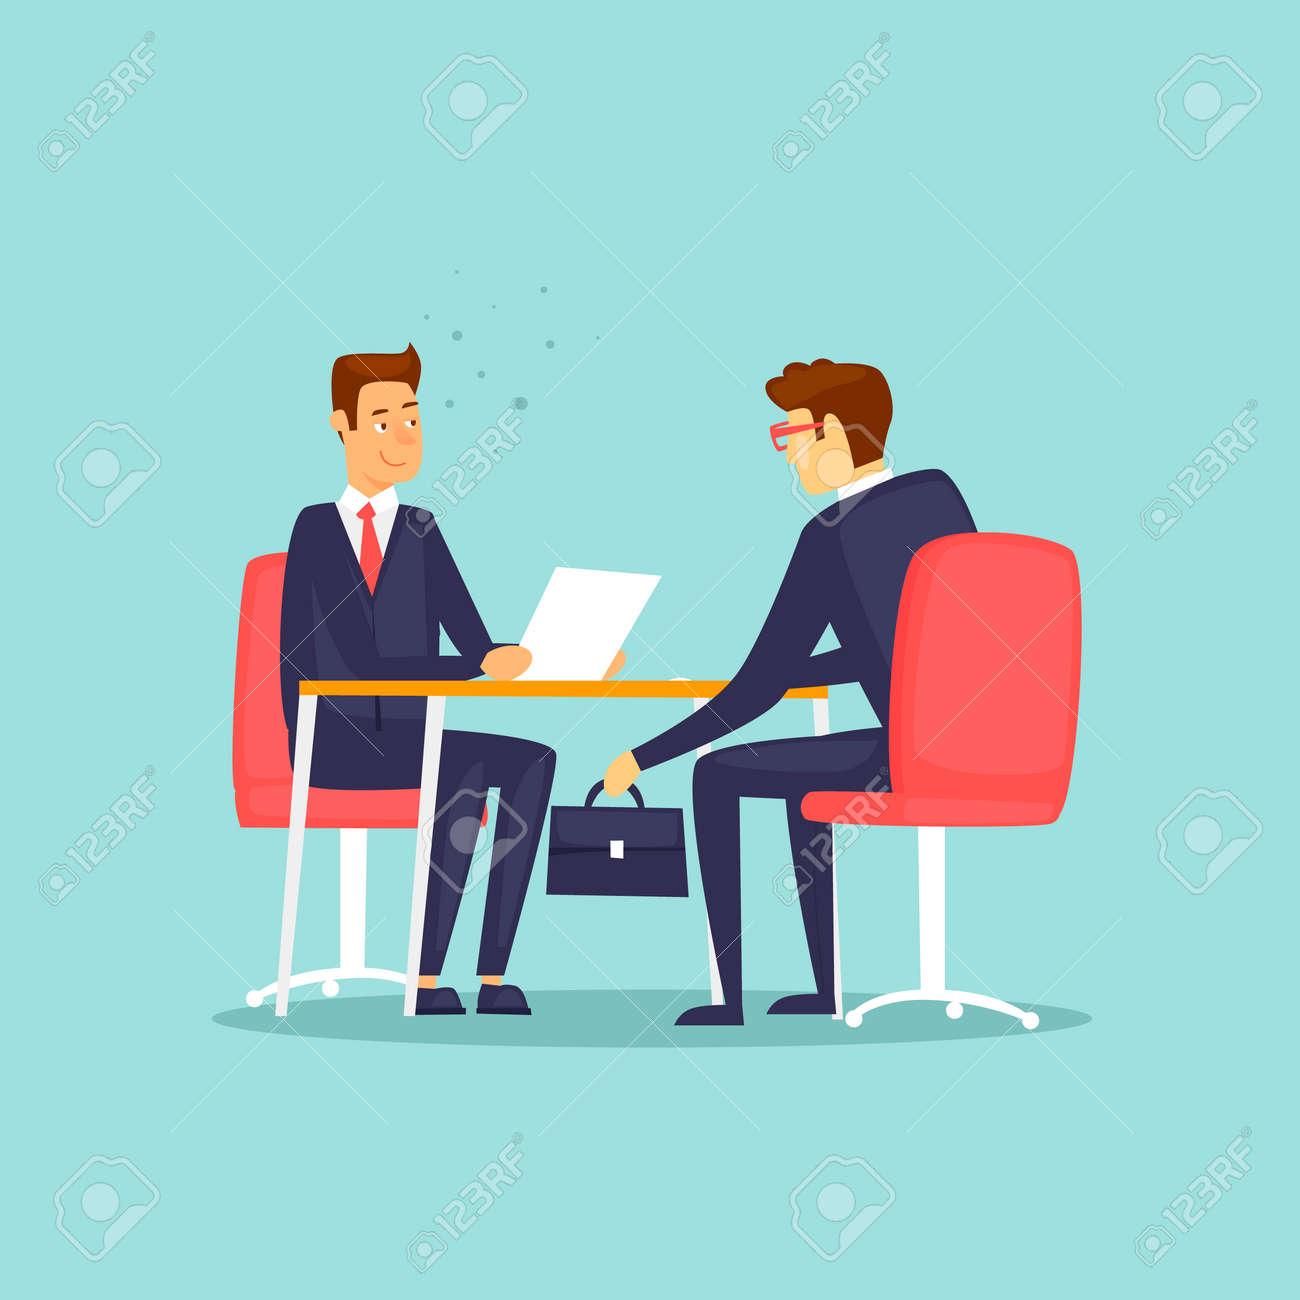 Businessman gives a bribe. Flat design vector illustration. - 94826184